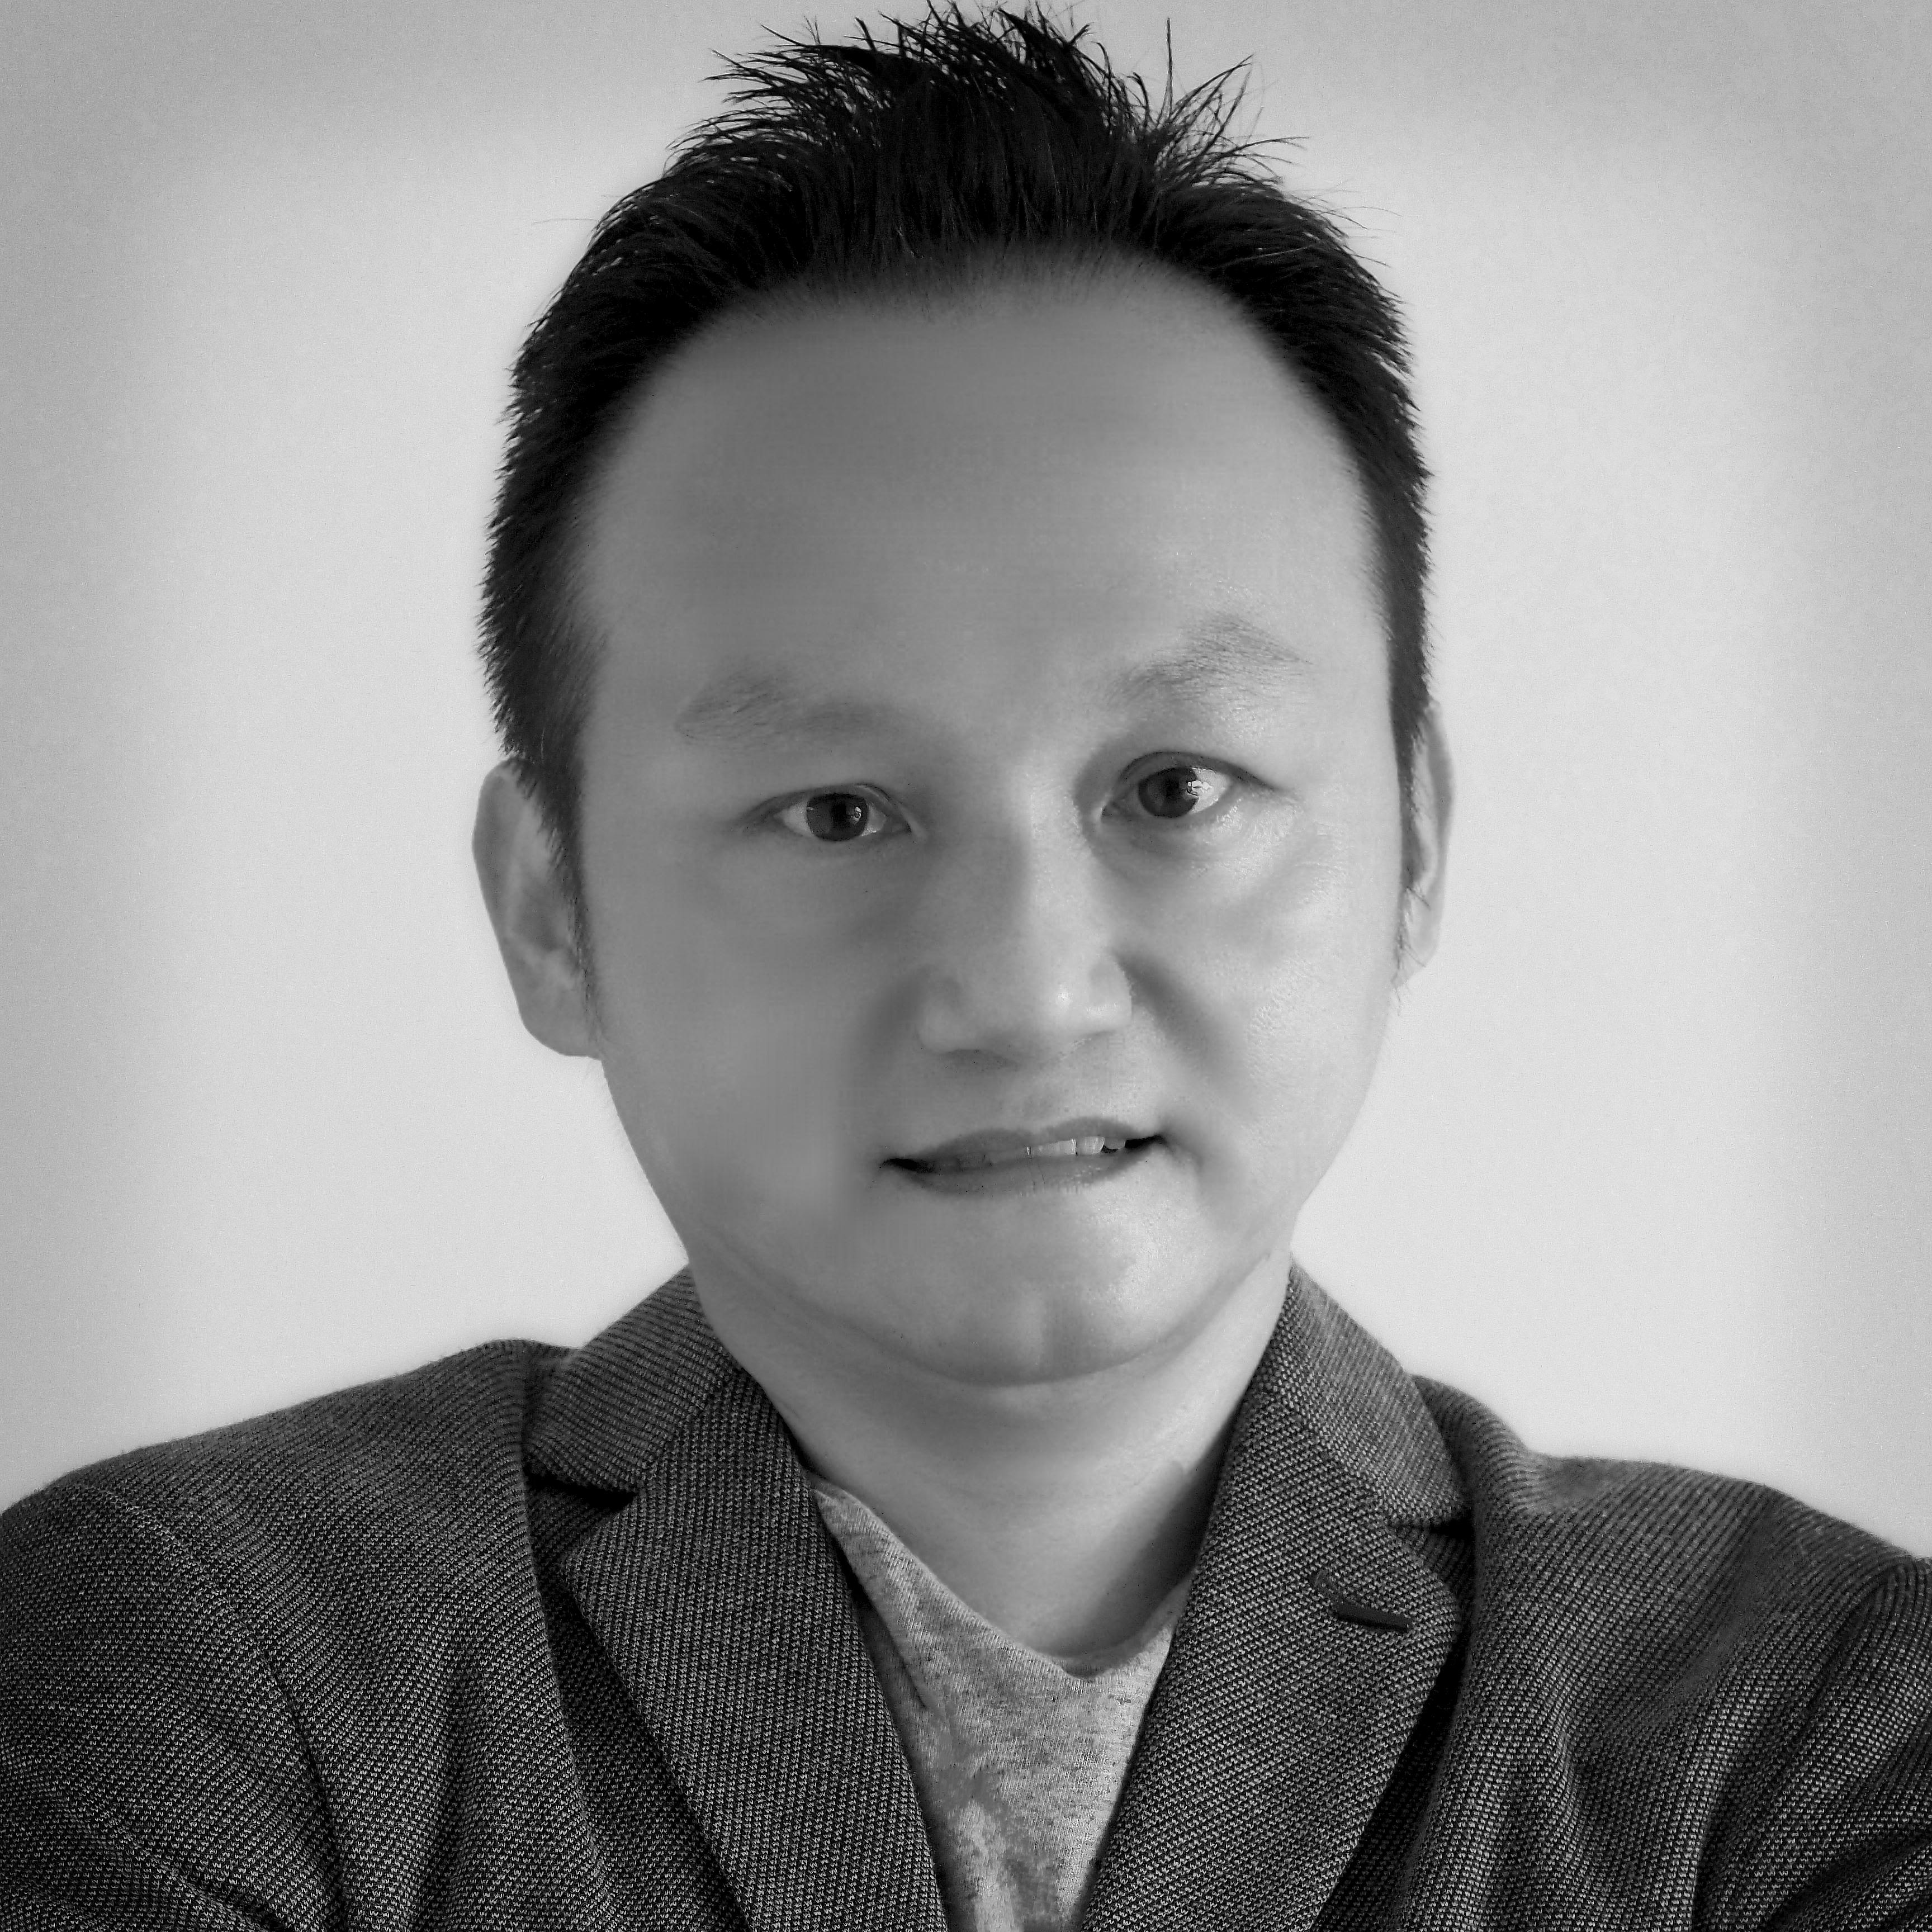 Raymond Tan